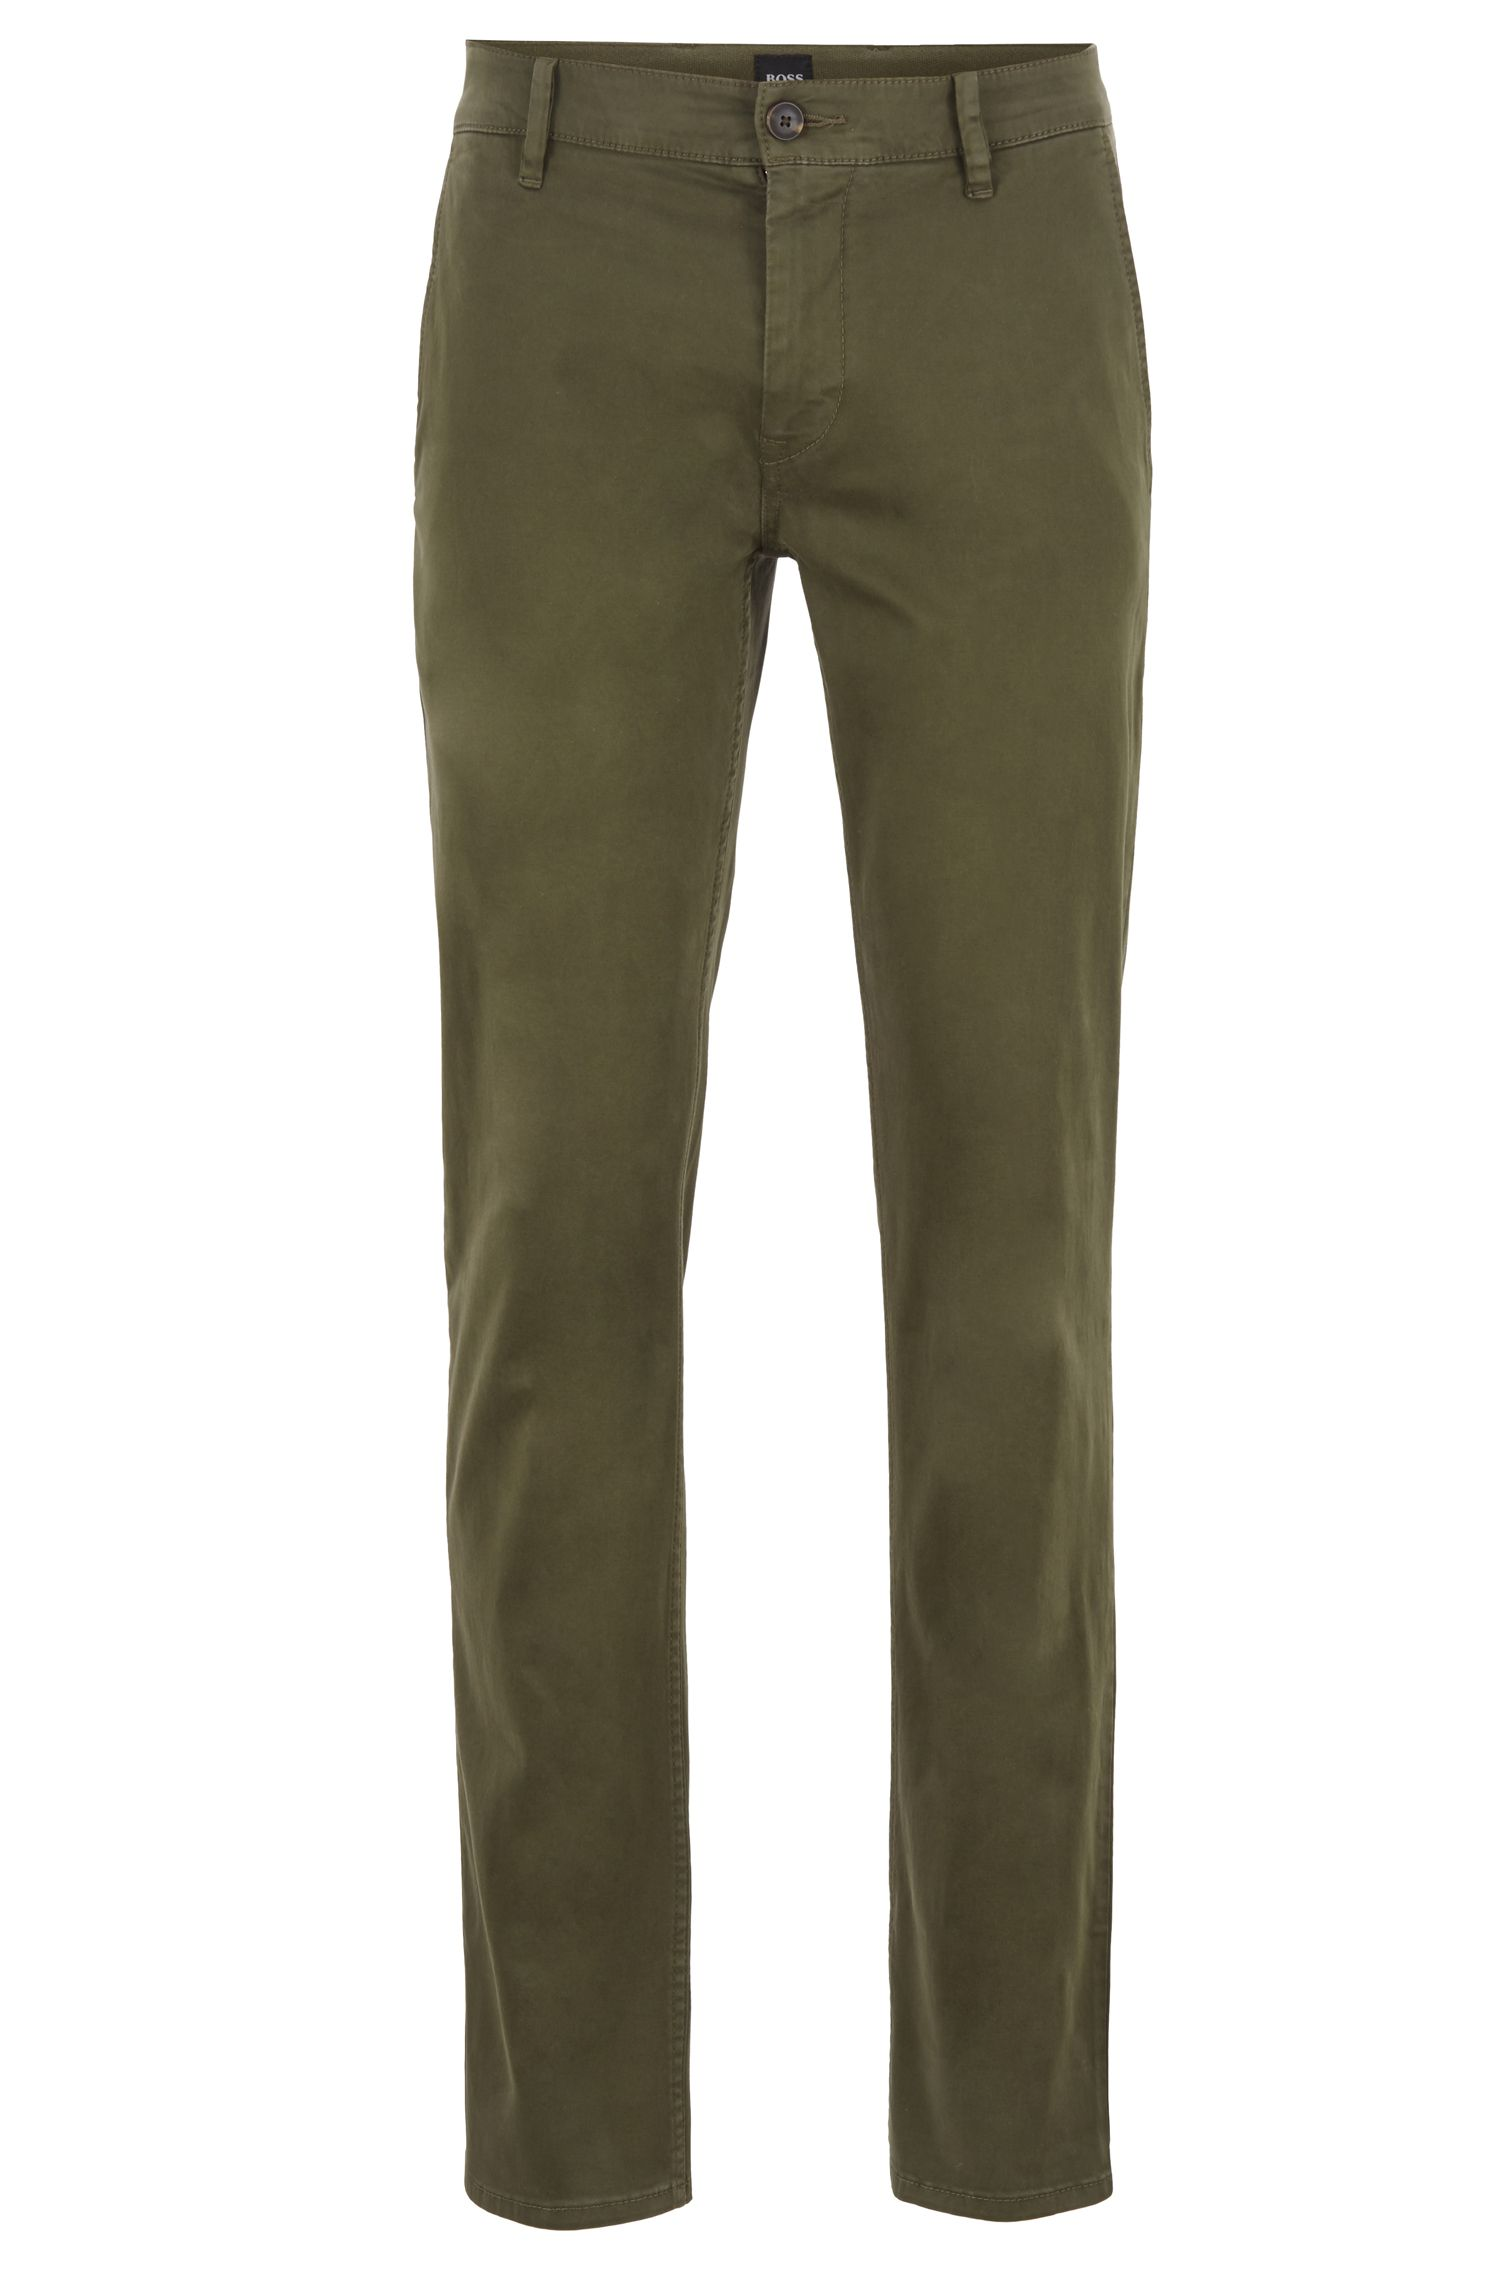 Chino casual Slim Fit en coton stretch brossé, Vert sombre